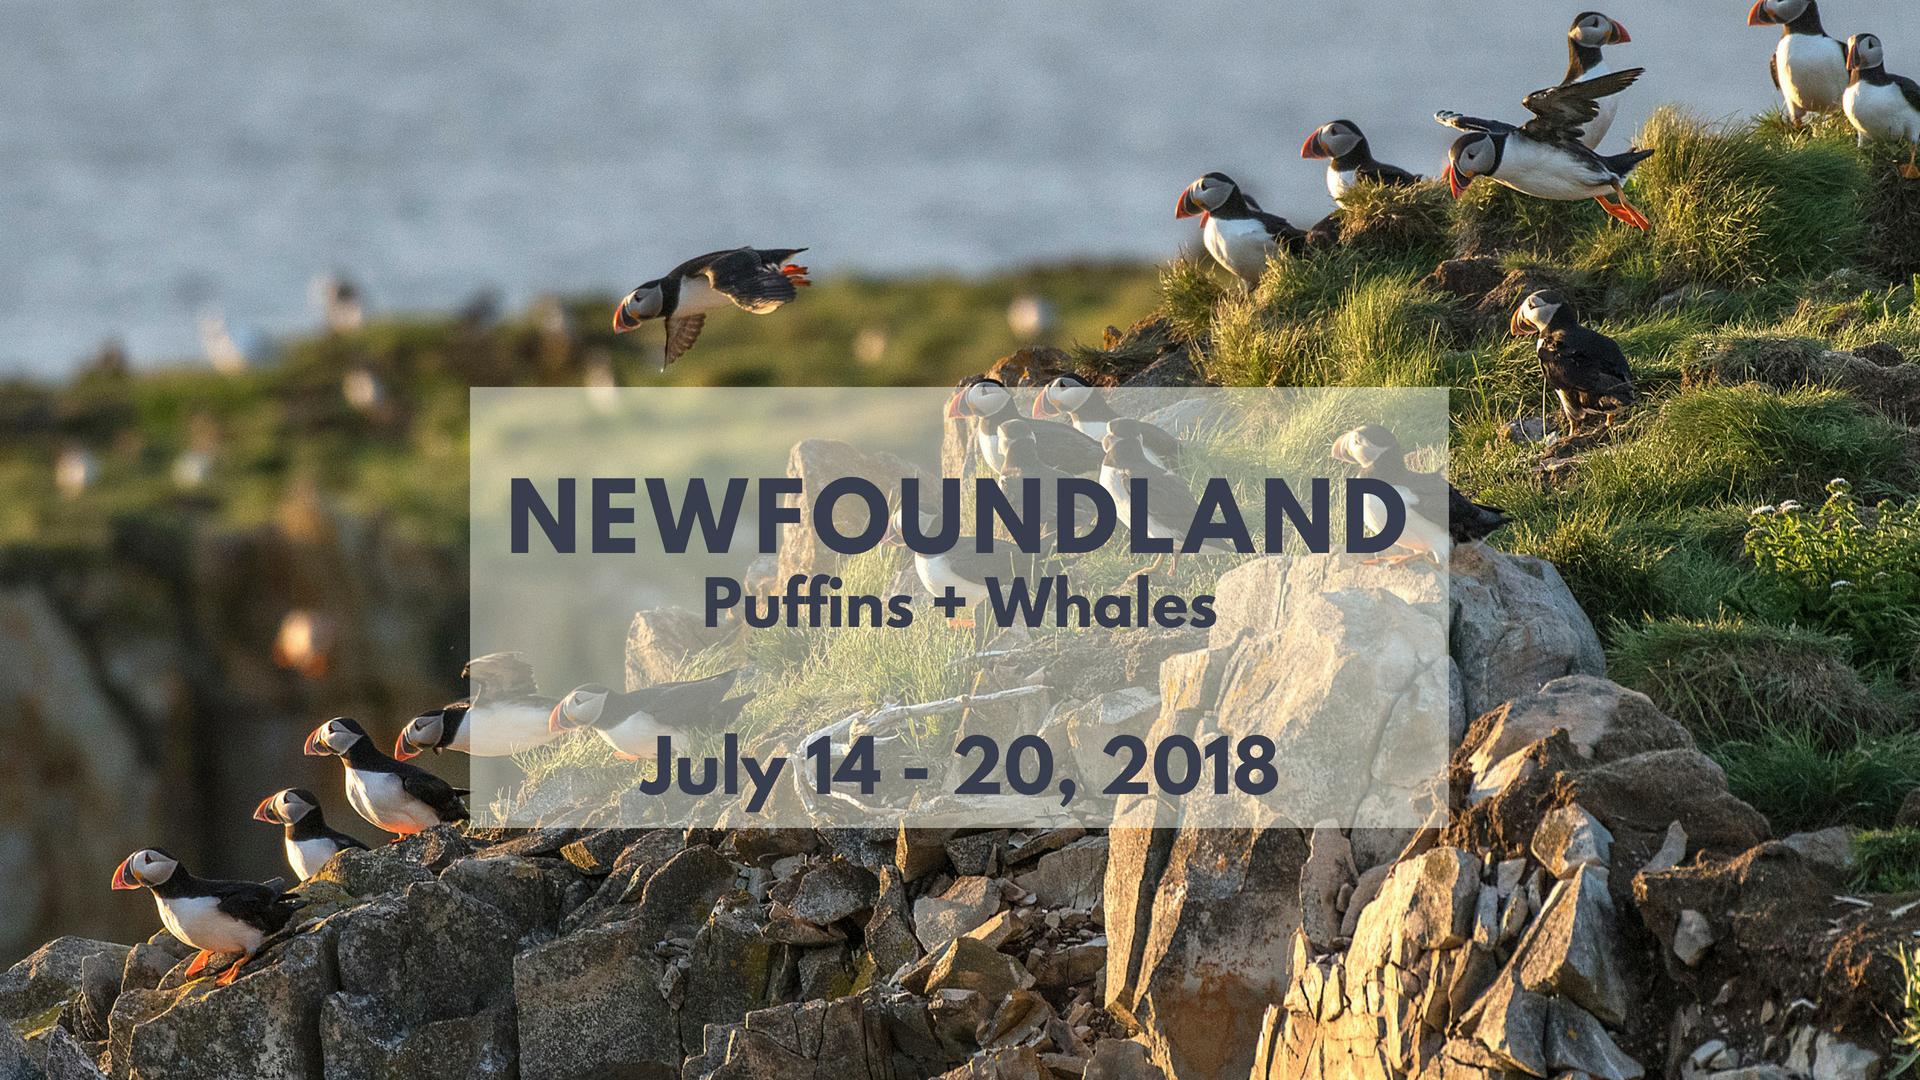 Newfoundland Photo Tour - North of 49 Photography